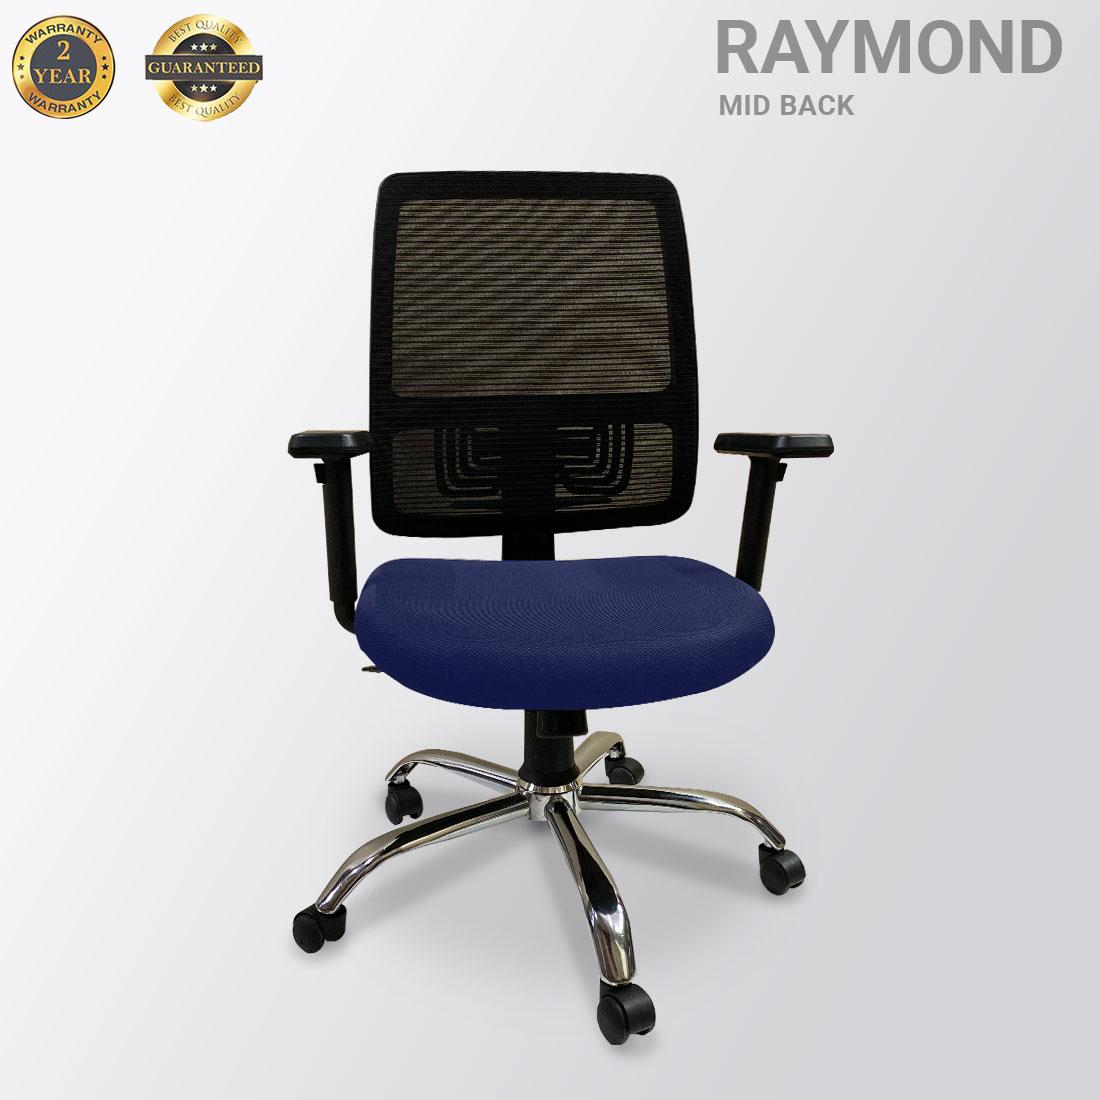 RAYMOND  MID BACK MESH BLUE